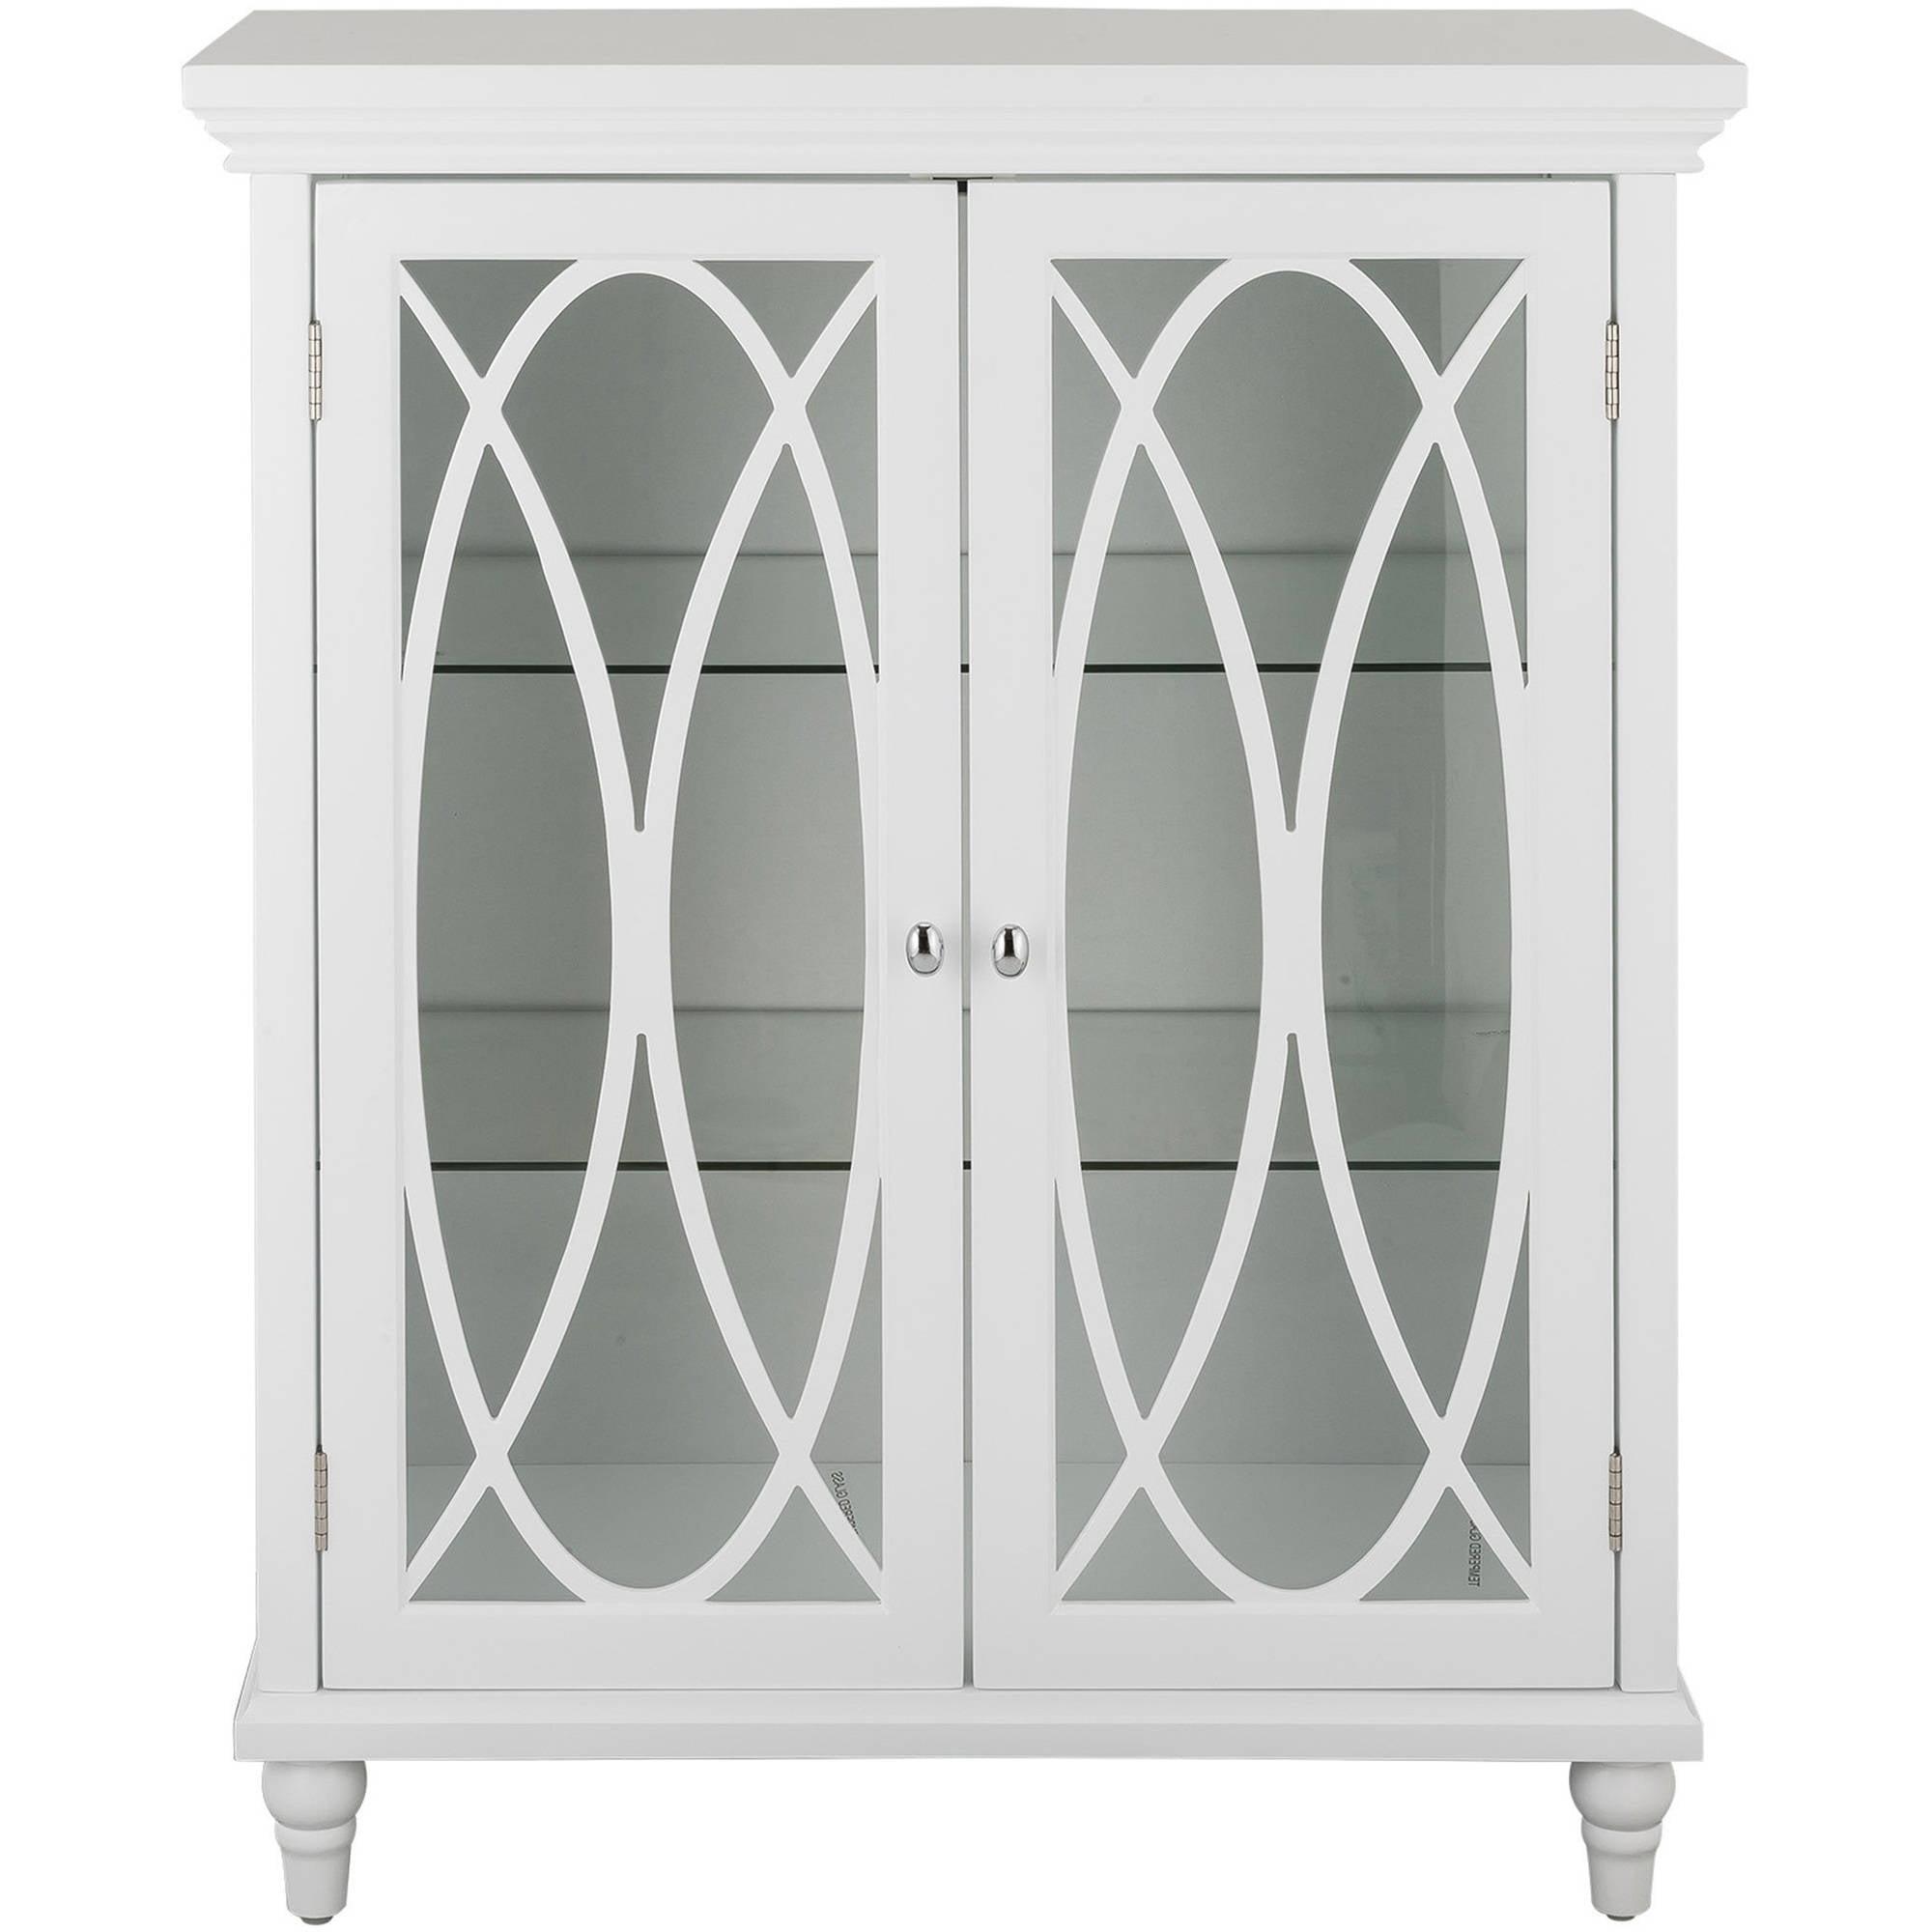 "Elegant Home Fashions 32"" H Miller Double Door Floor Cabinet With 2 Adjustable Tempered Glass Shelves"